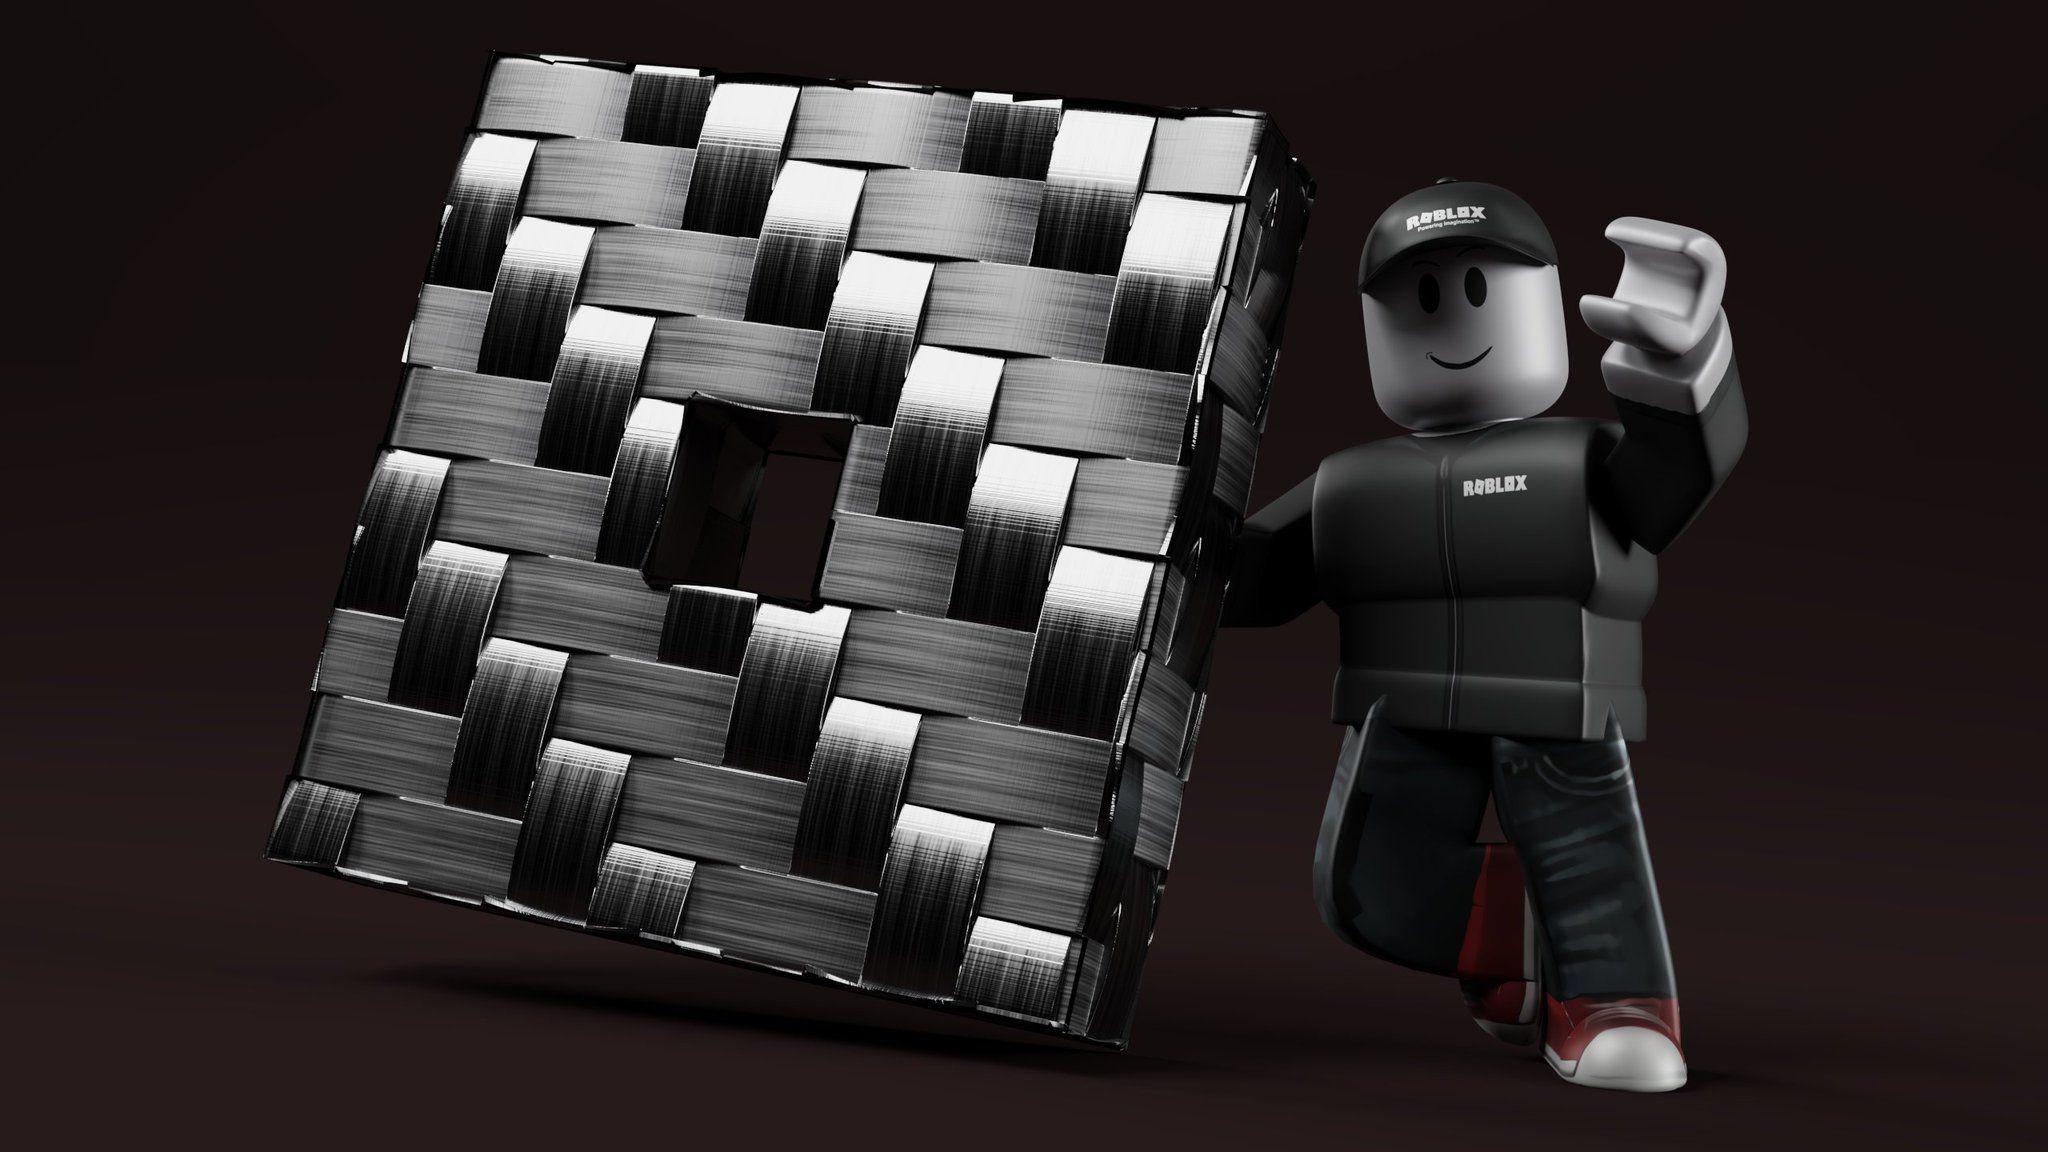 Black Roblox Wallpapers - Wallpaper Cave